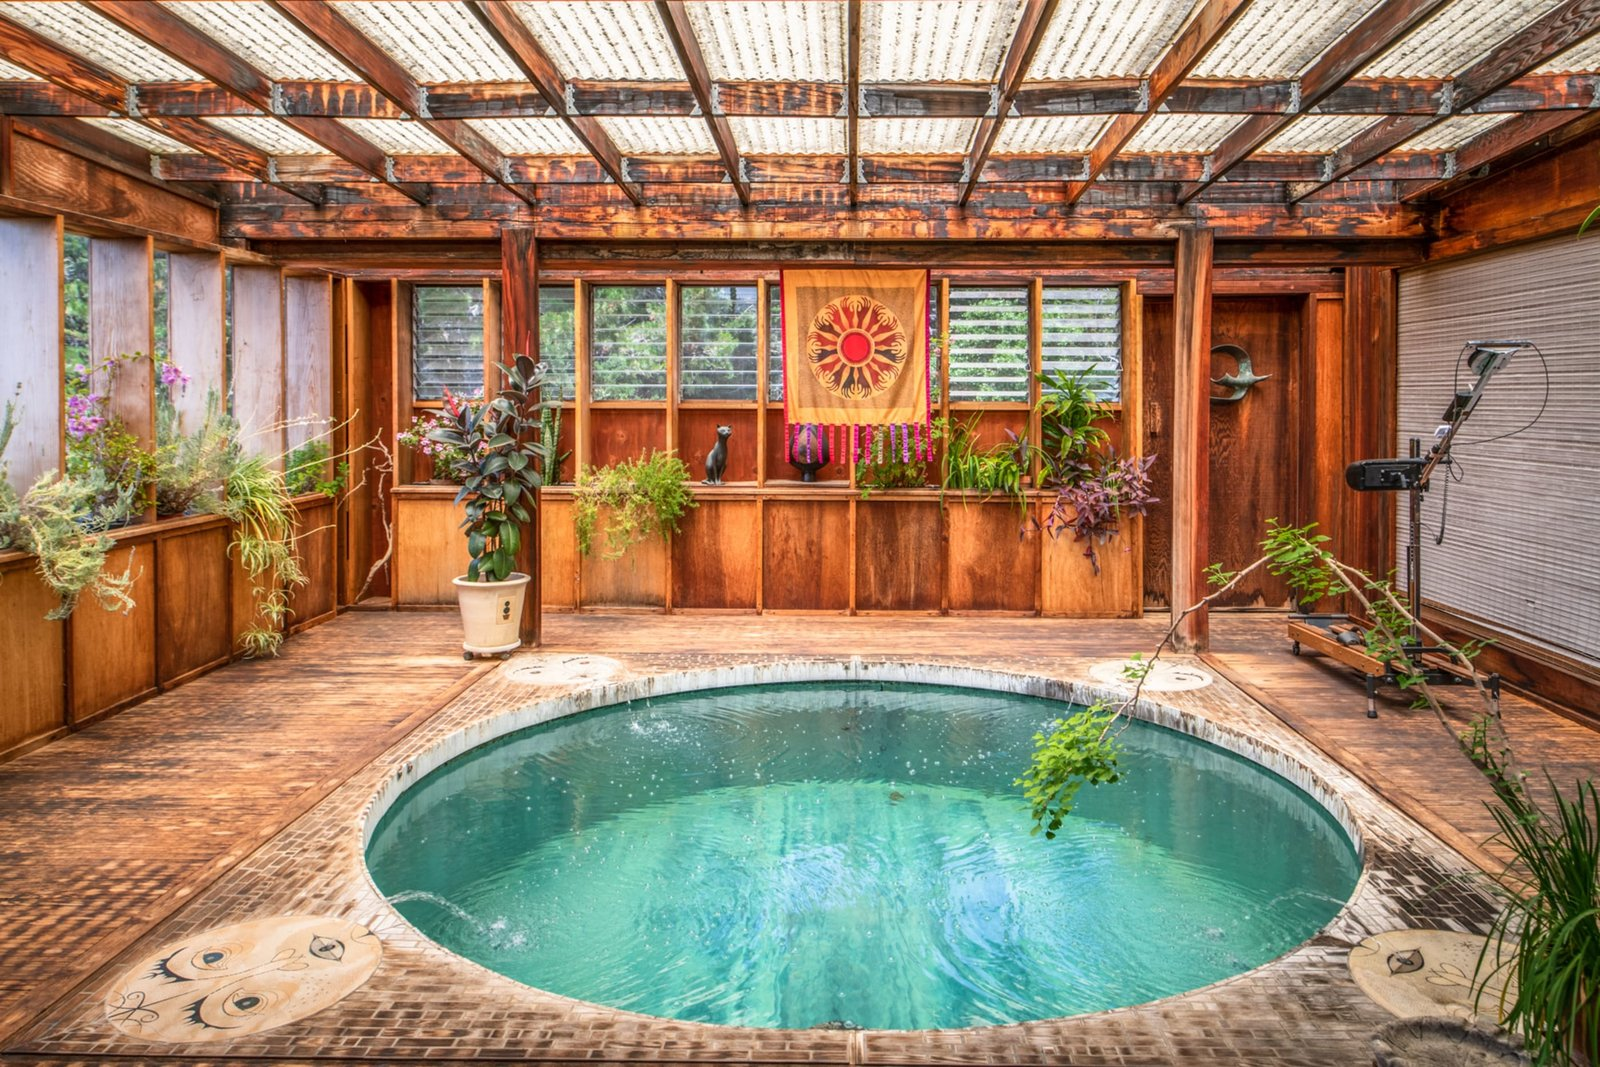 Renowned Artist Emile Norman's Sensational Big Sur Home Lists for $2M